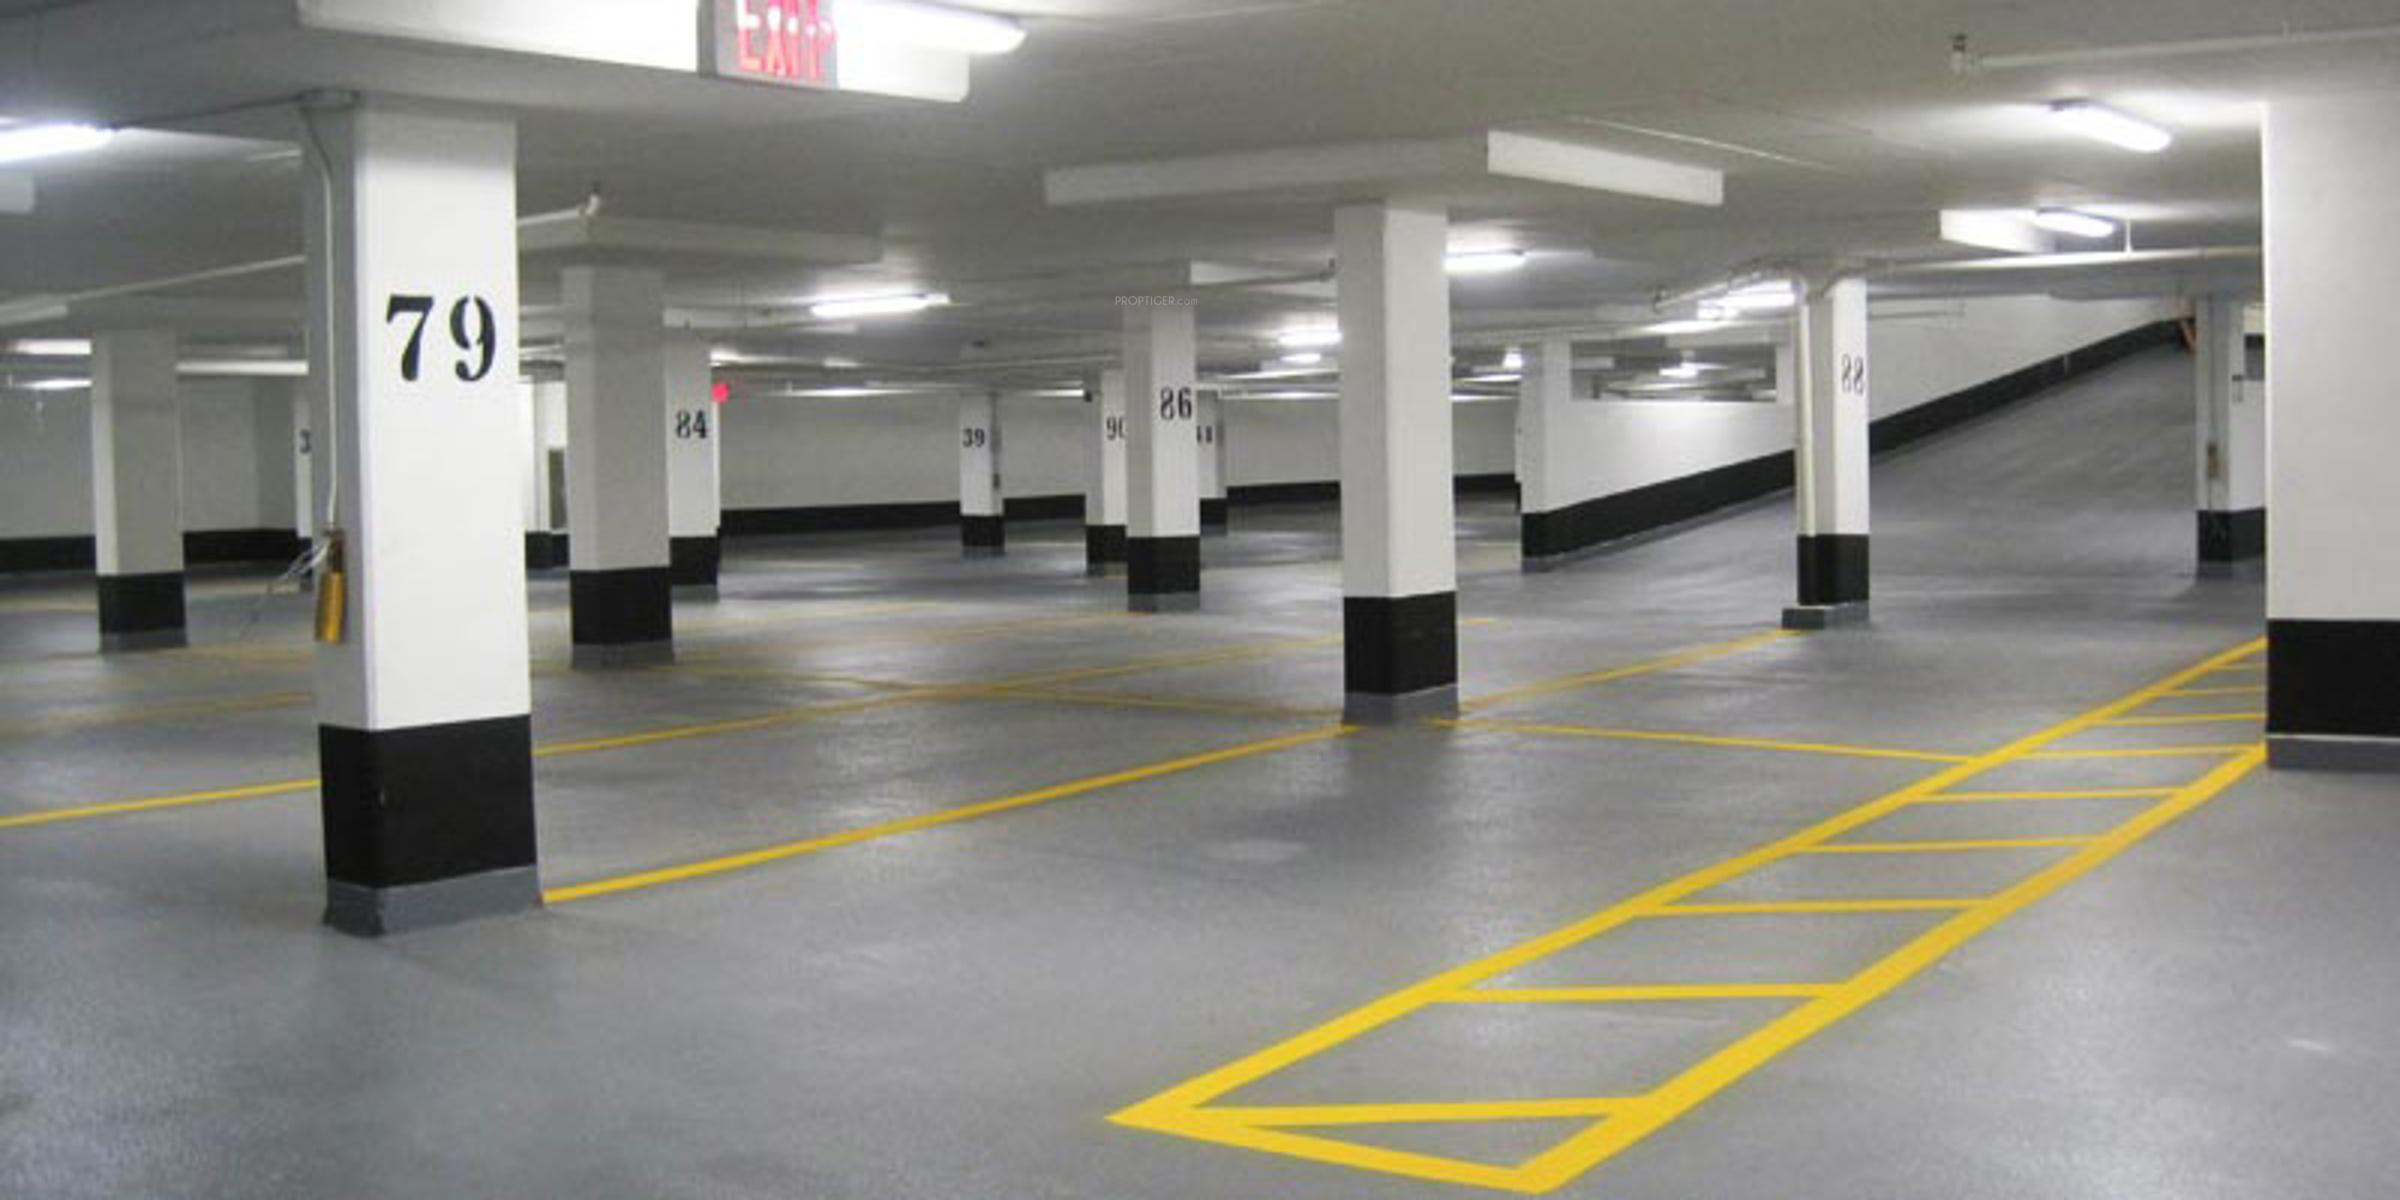 capitol-car-parking-6255911 Underground Wiring on underground generator, underground transmission, underground wire in shorts,